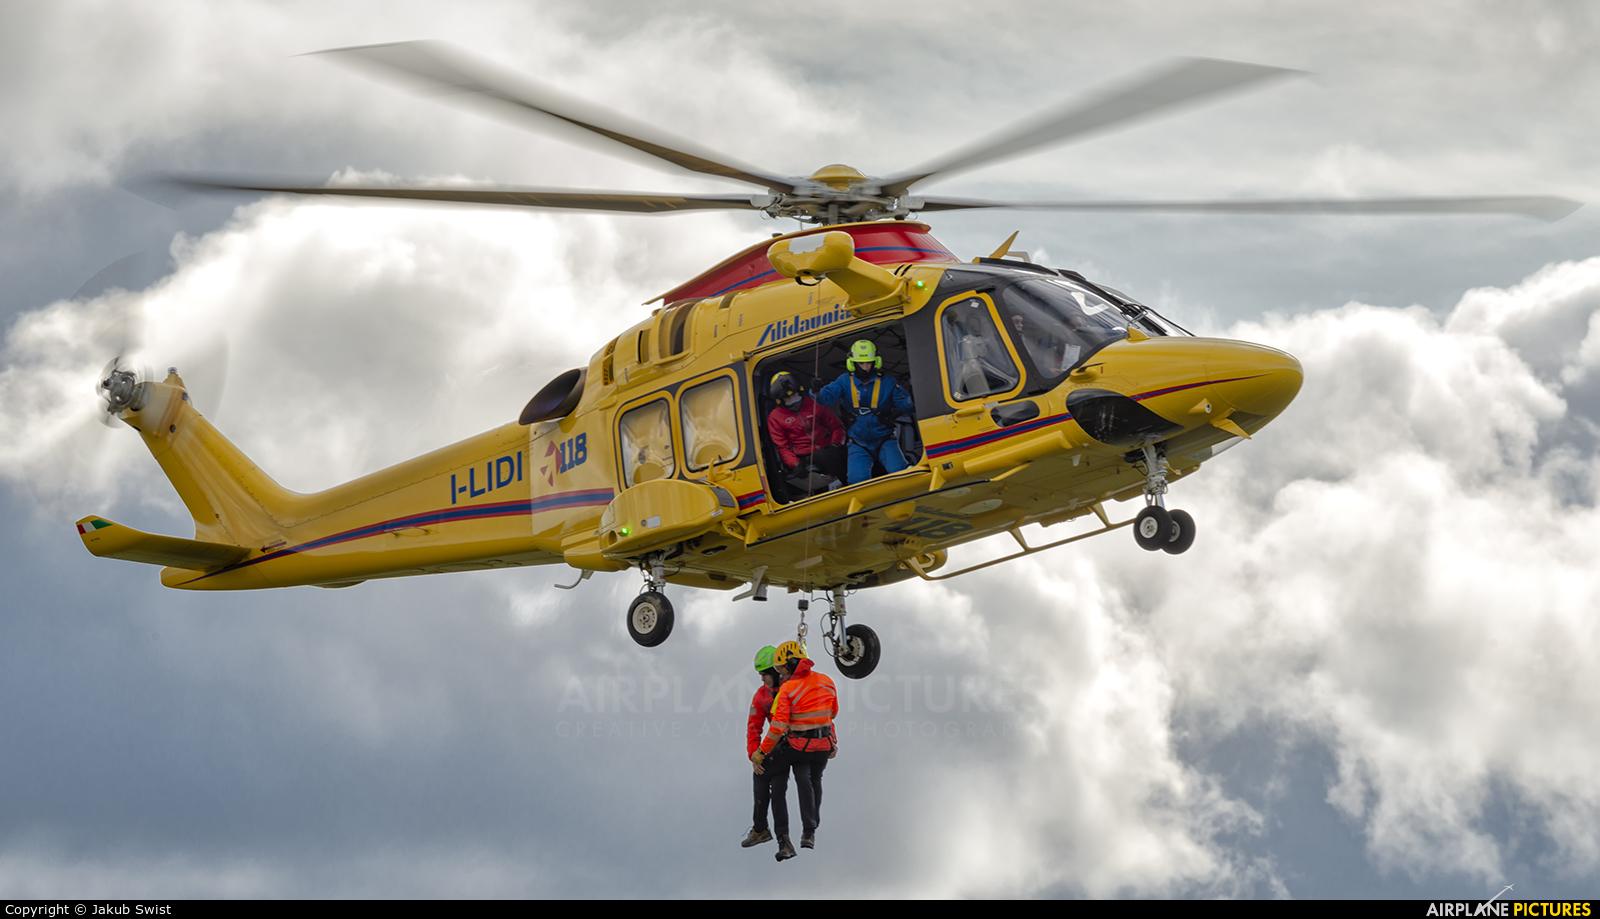 Alidaunia Società di Navigazione Aerea I-LIDI aircraft at Nowy Targ Airport